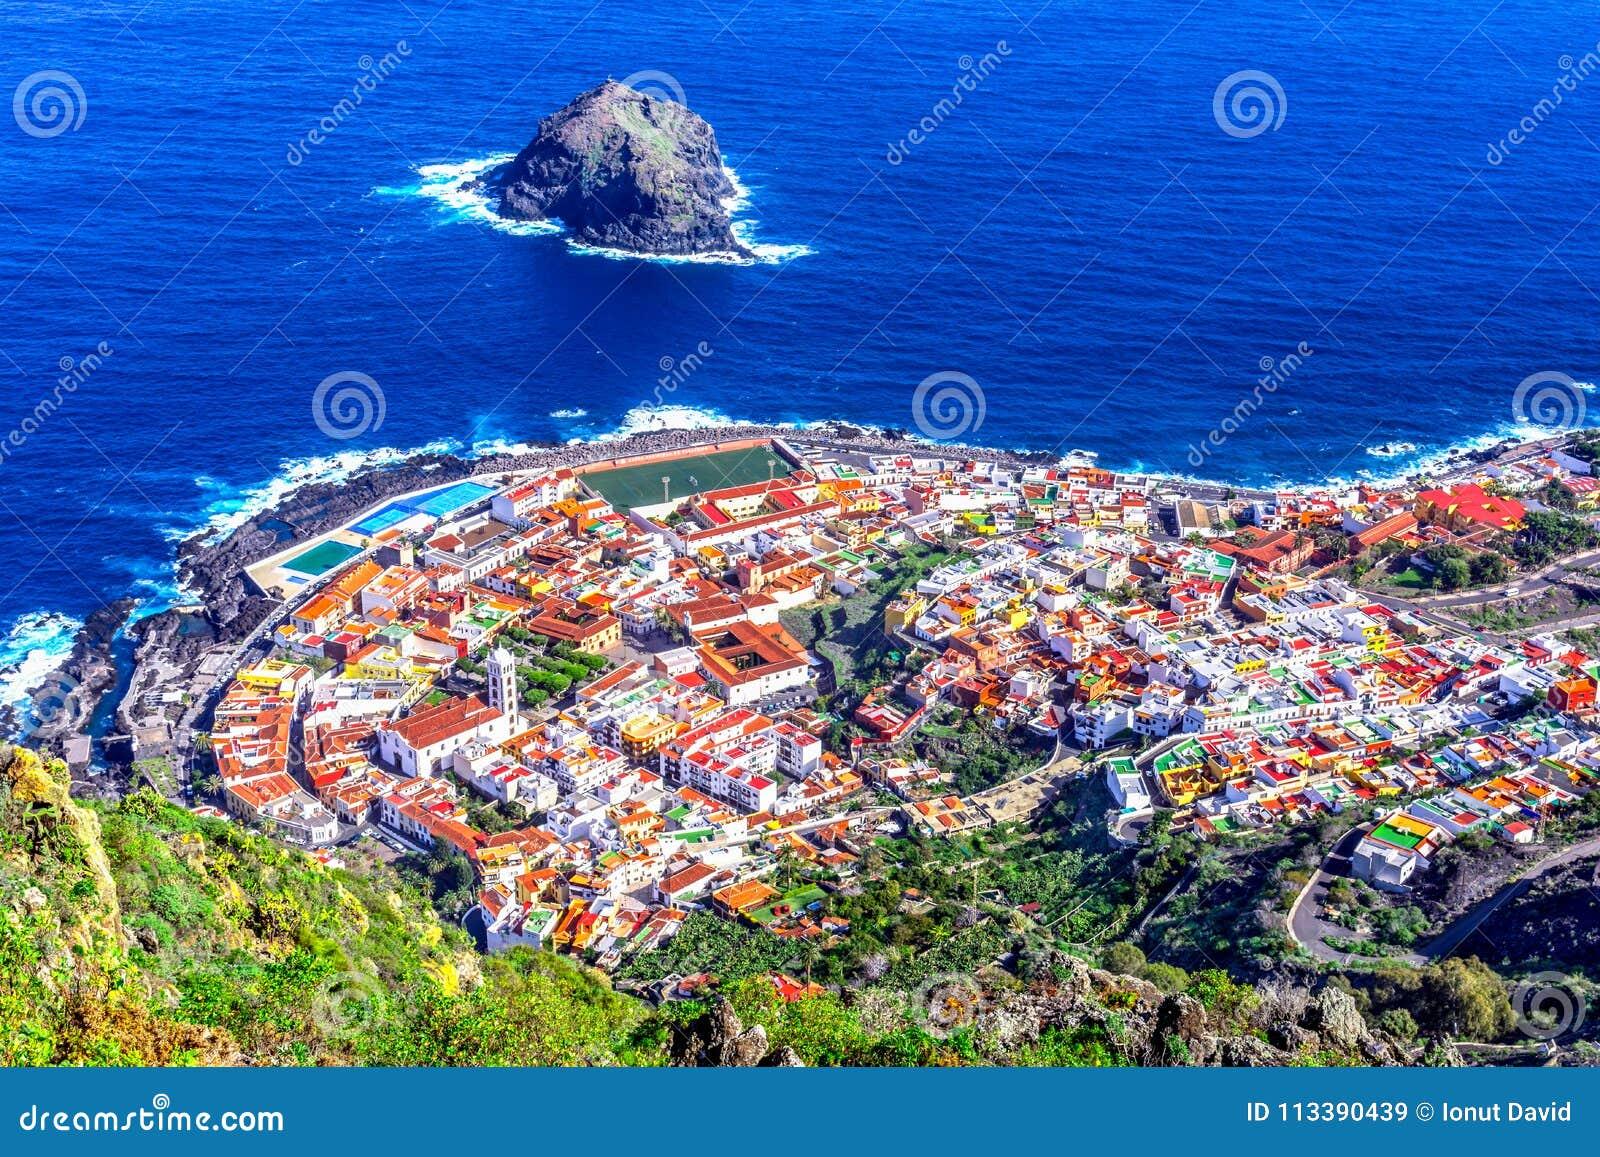 Garachico, Ténérife, Îles Canaries, Espagne : Aperçu du col